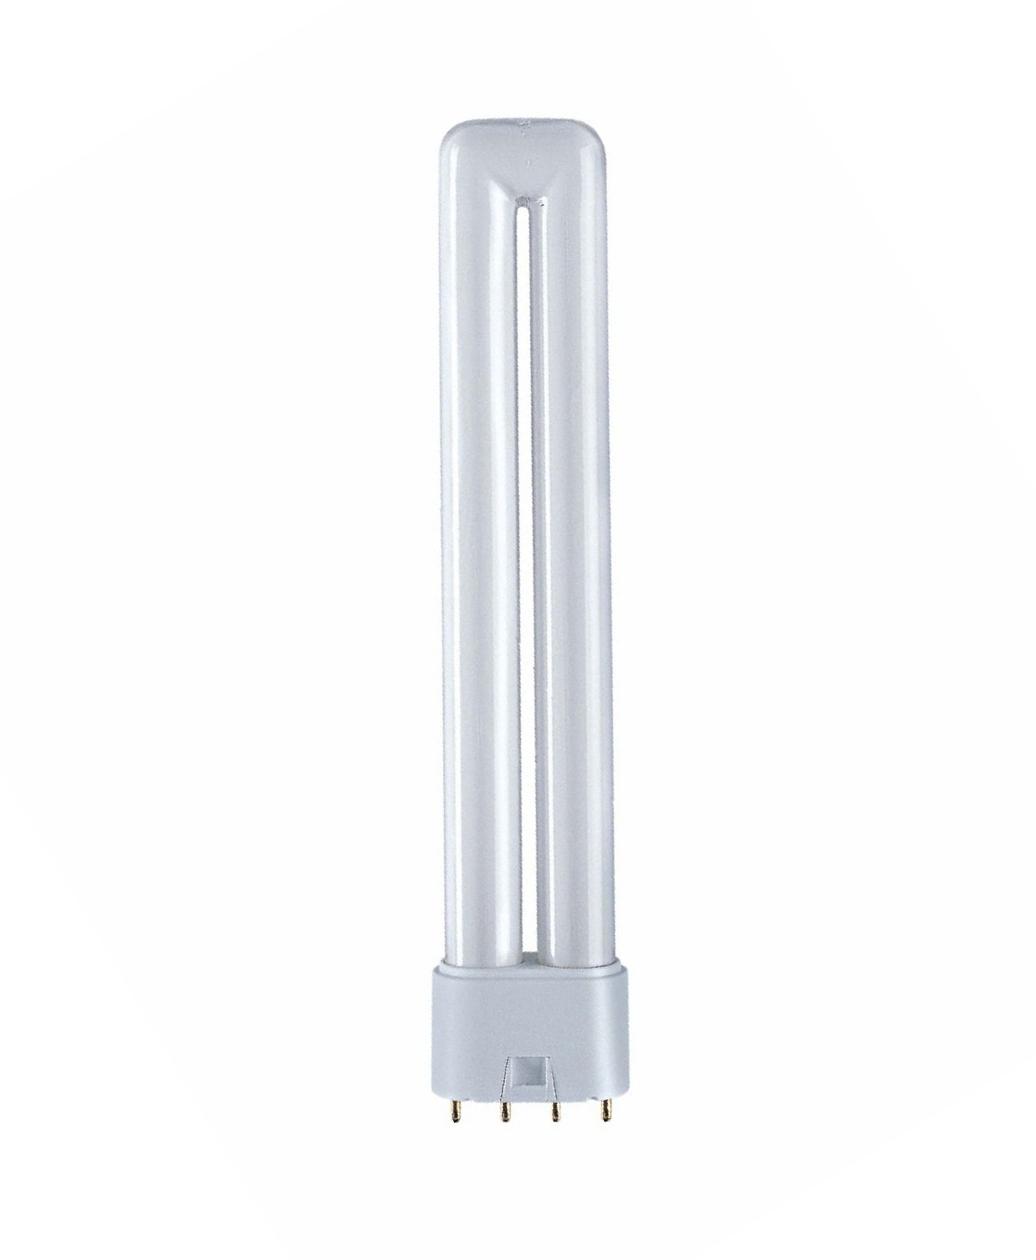 1 Stk TC-L 18W/830 2G11 Kompaktleuchtstofflampe LI5V010731